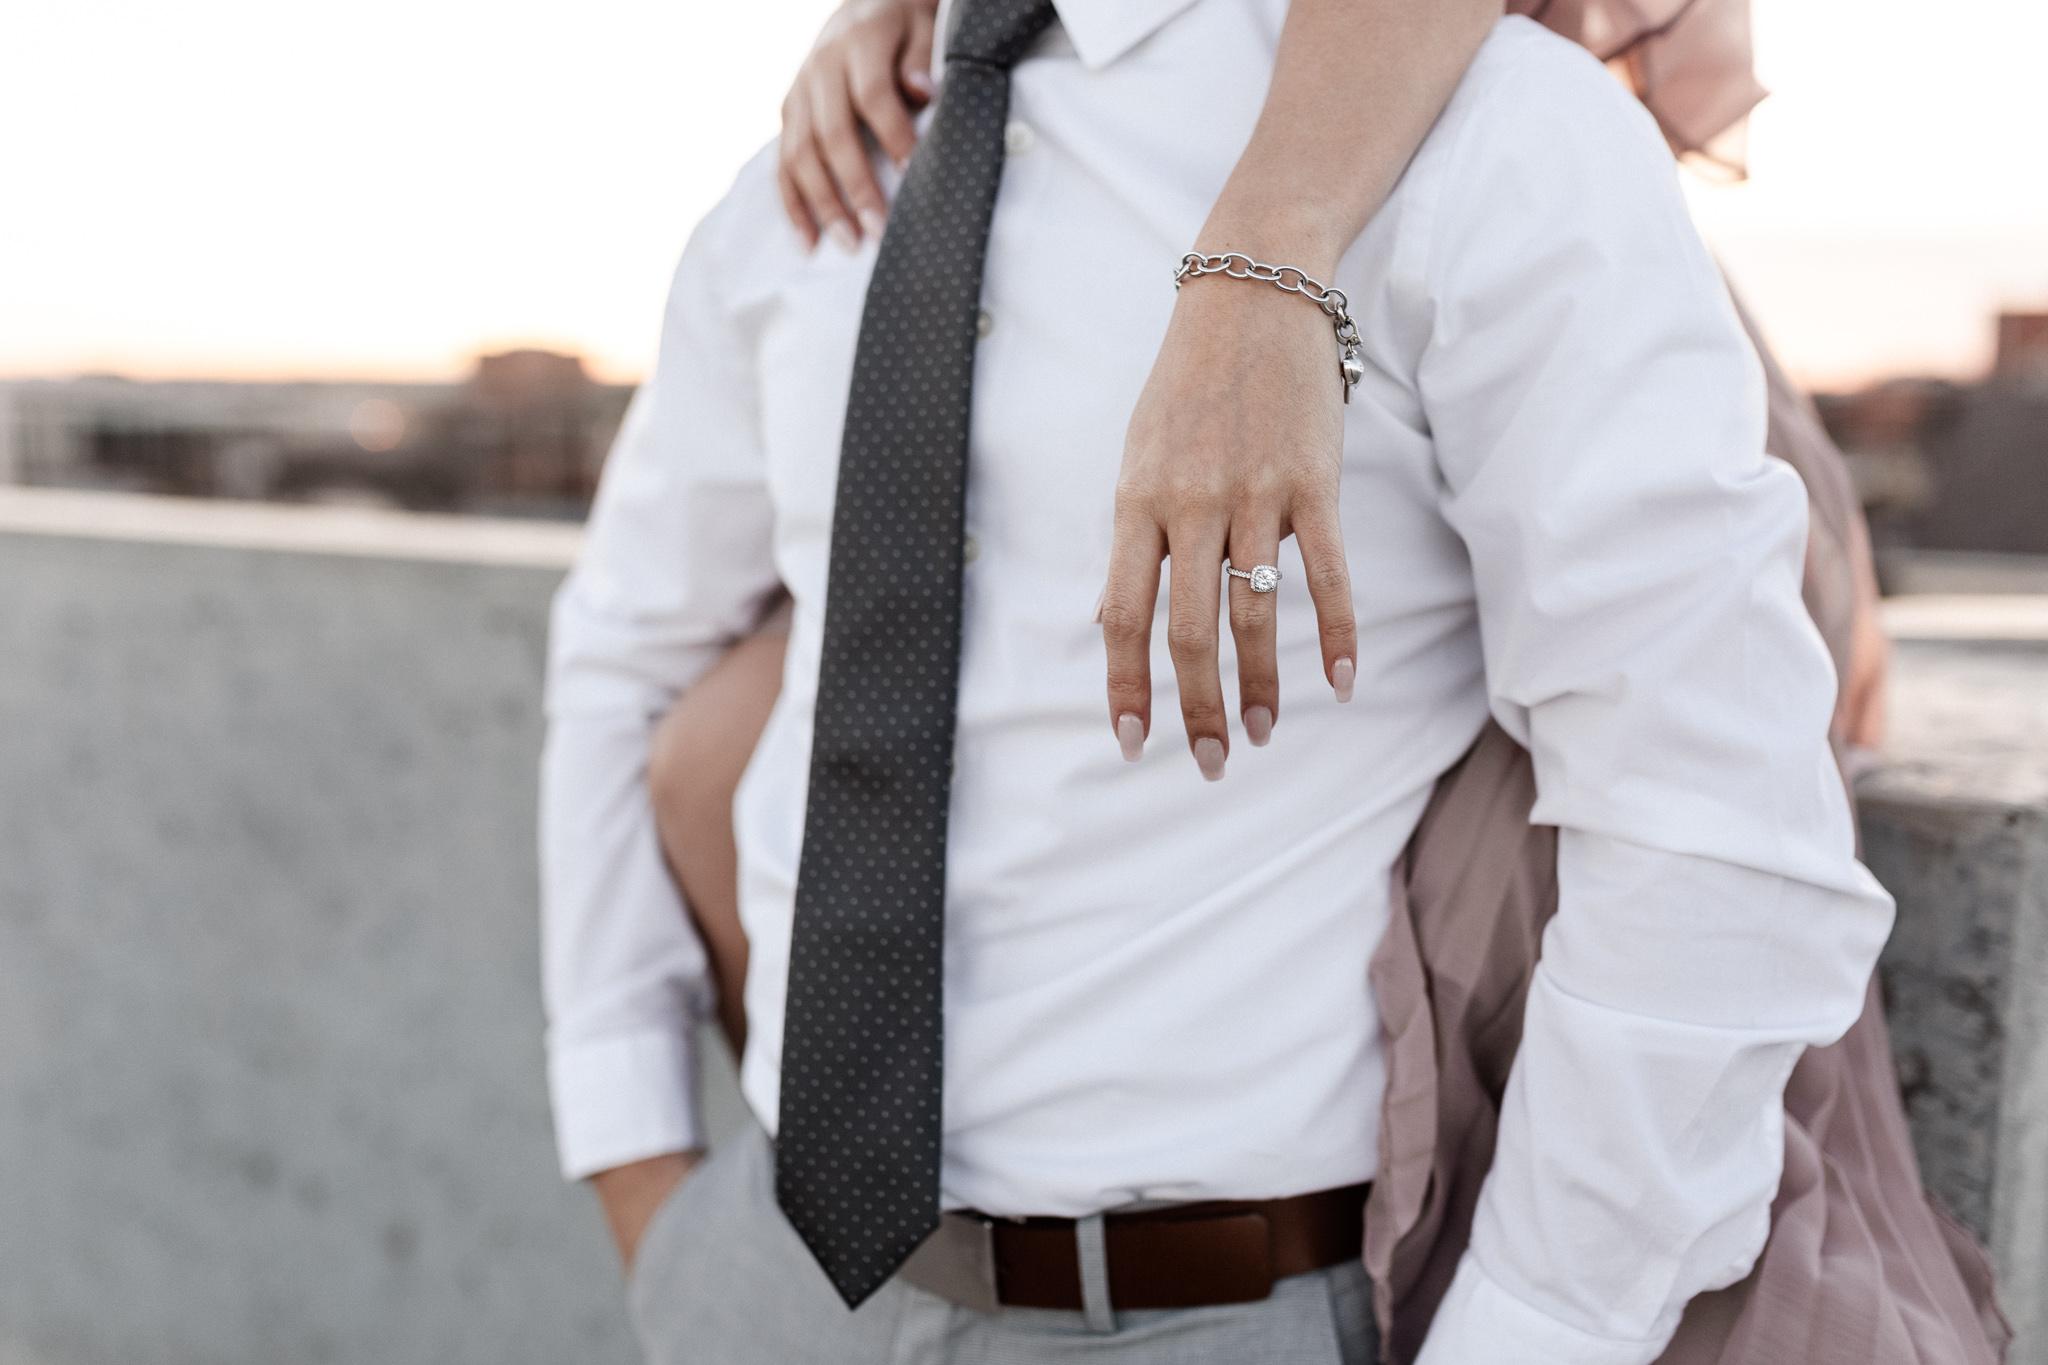 Hieu + Teresa | Colorful Romantic Downtown Engagements | Oklahoma Wedding Photographer-66.jpg